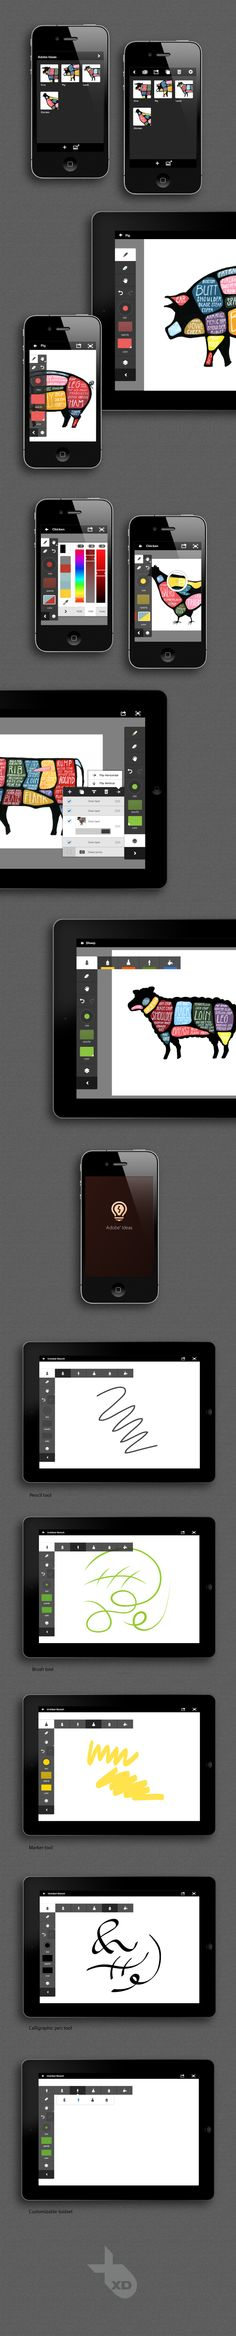 Vector sketching app for tablet & mobile.